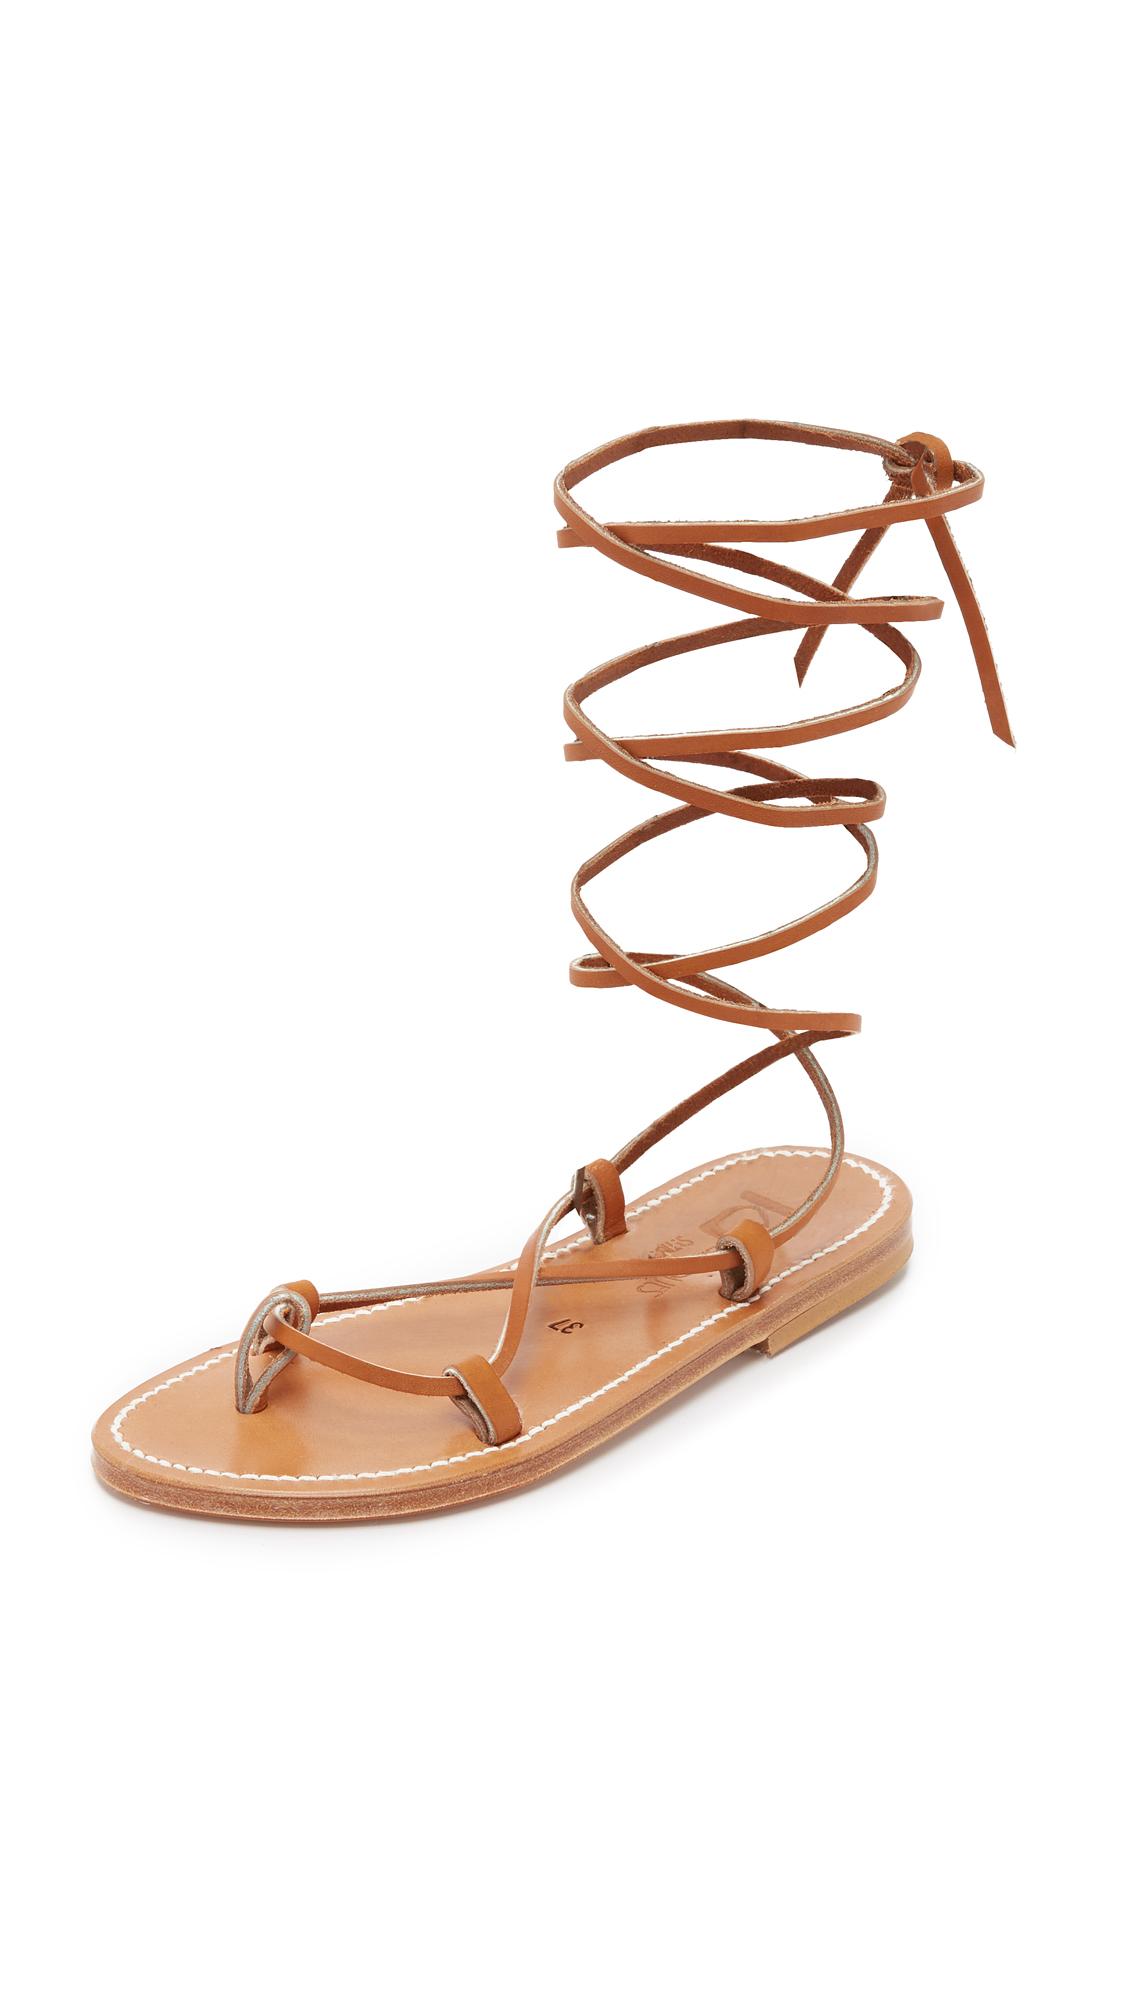 0fd325790f6 K. Jacques Bikini Wrap Gladiator Sandals